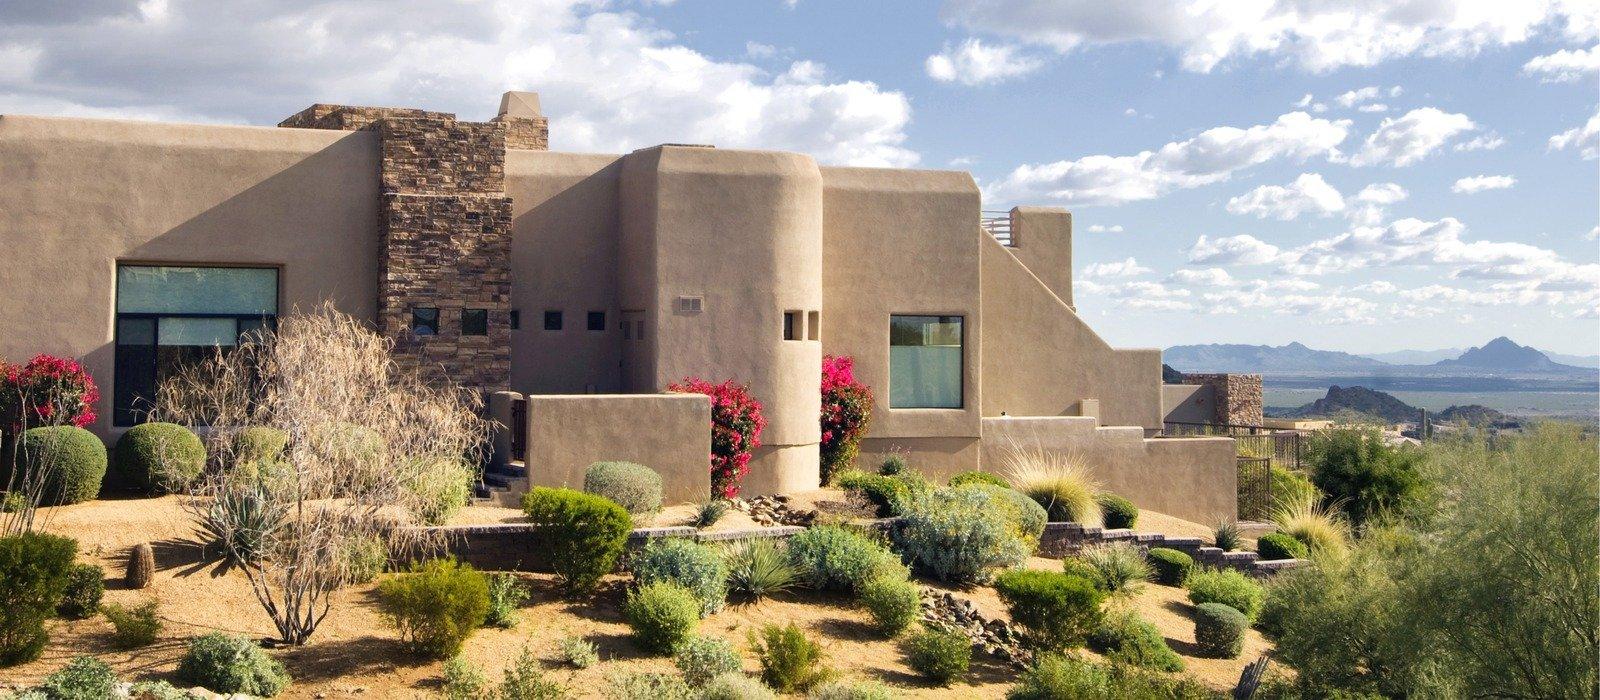 Window replacements in Phoenix, Arizona